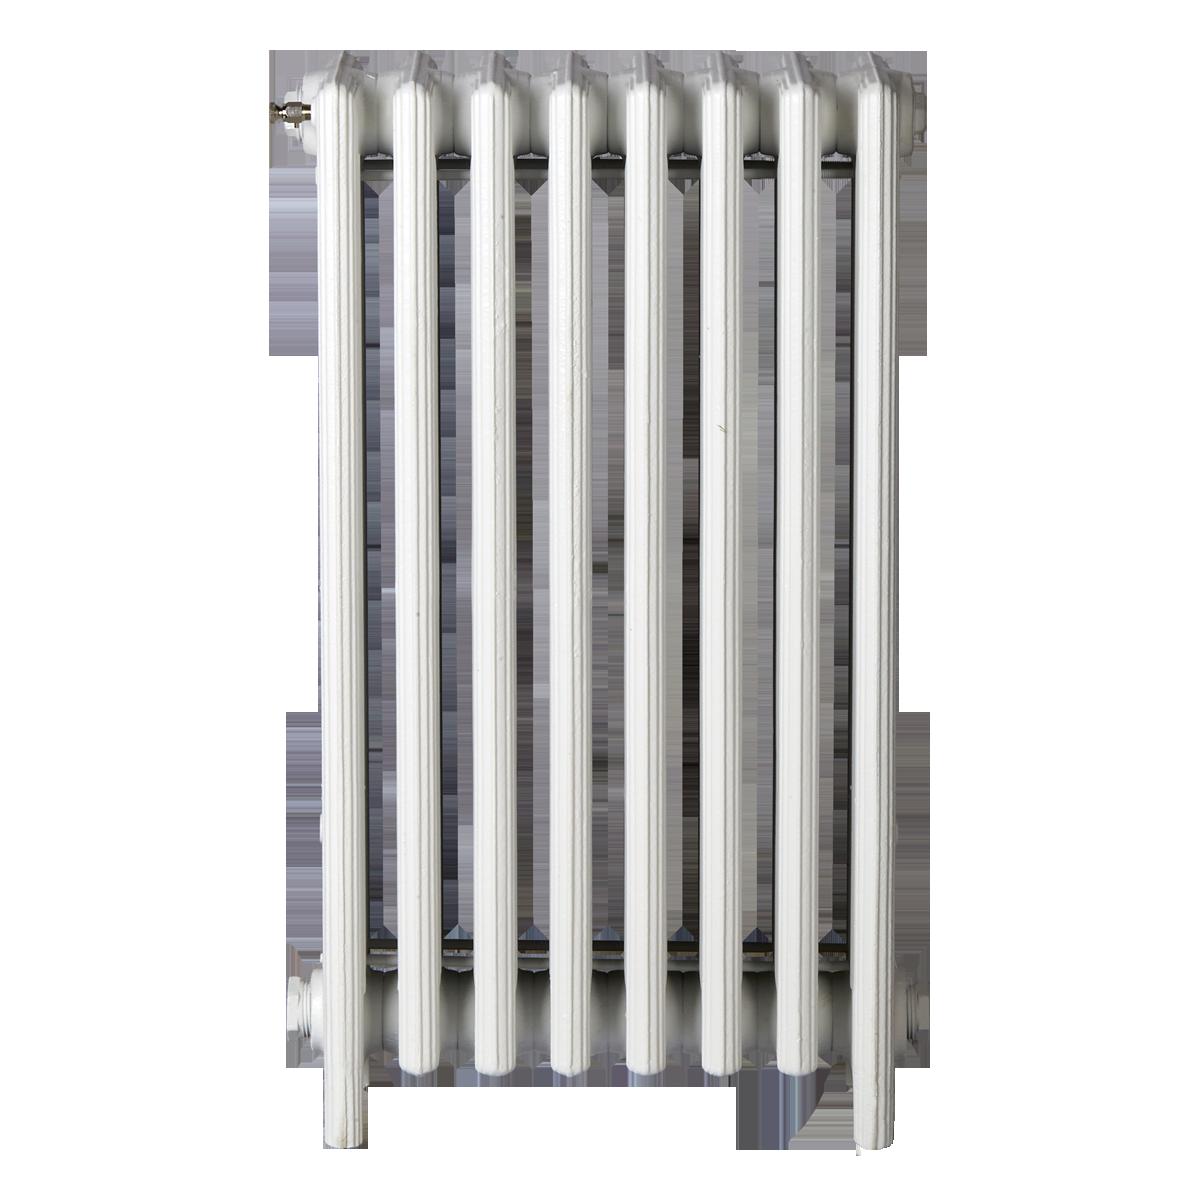 Ironworks Radiators Inc. classic column, slender column radiator